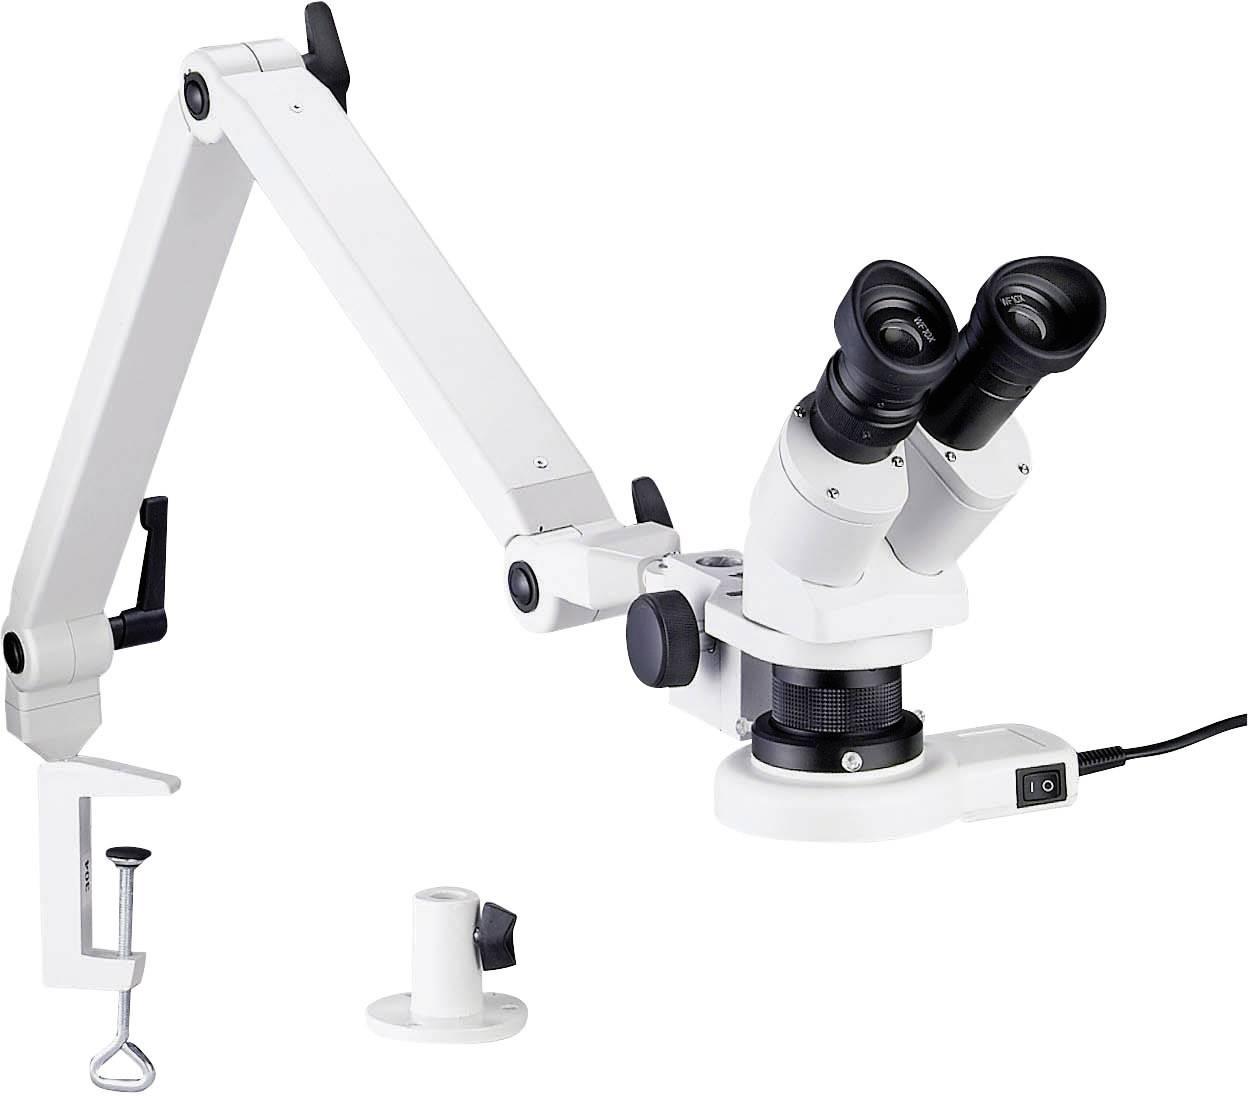 Stereomikroskop Bernstein 9-158 9-158, binokulárny, 20 x